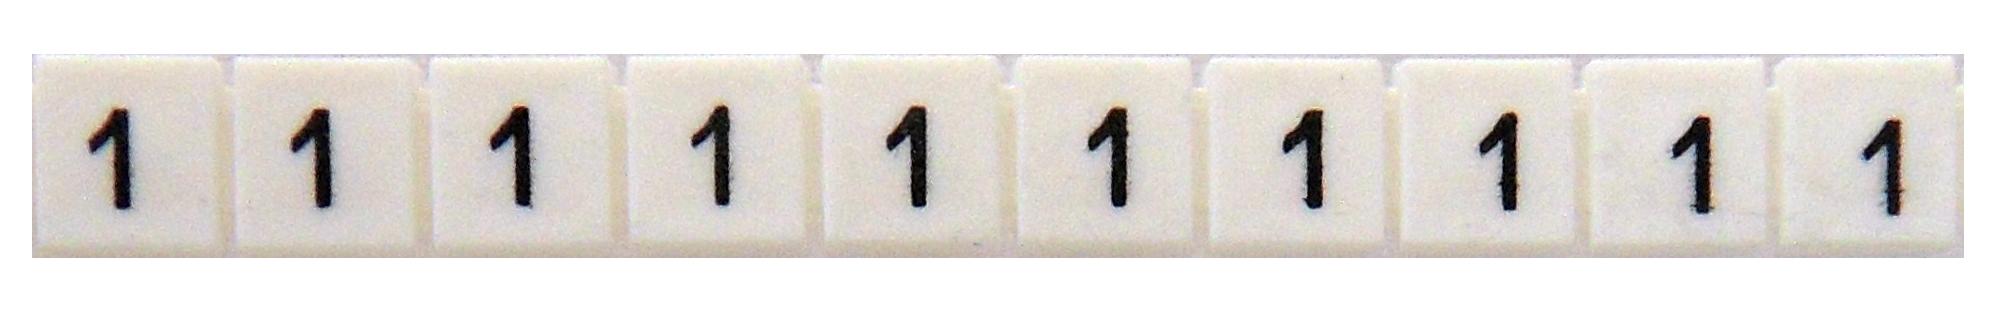 1 Stk Markierungsetiketten DY 5 bedruckt mit 1 (50-mal) IK697001--